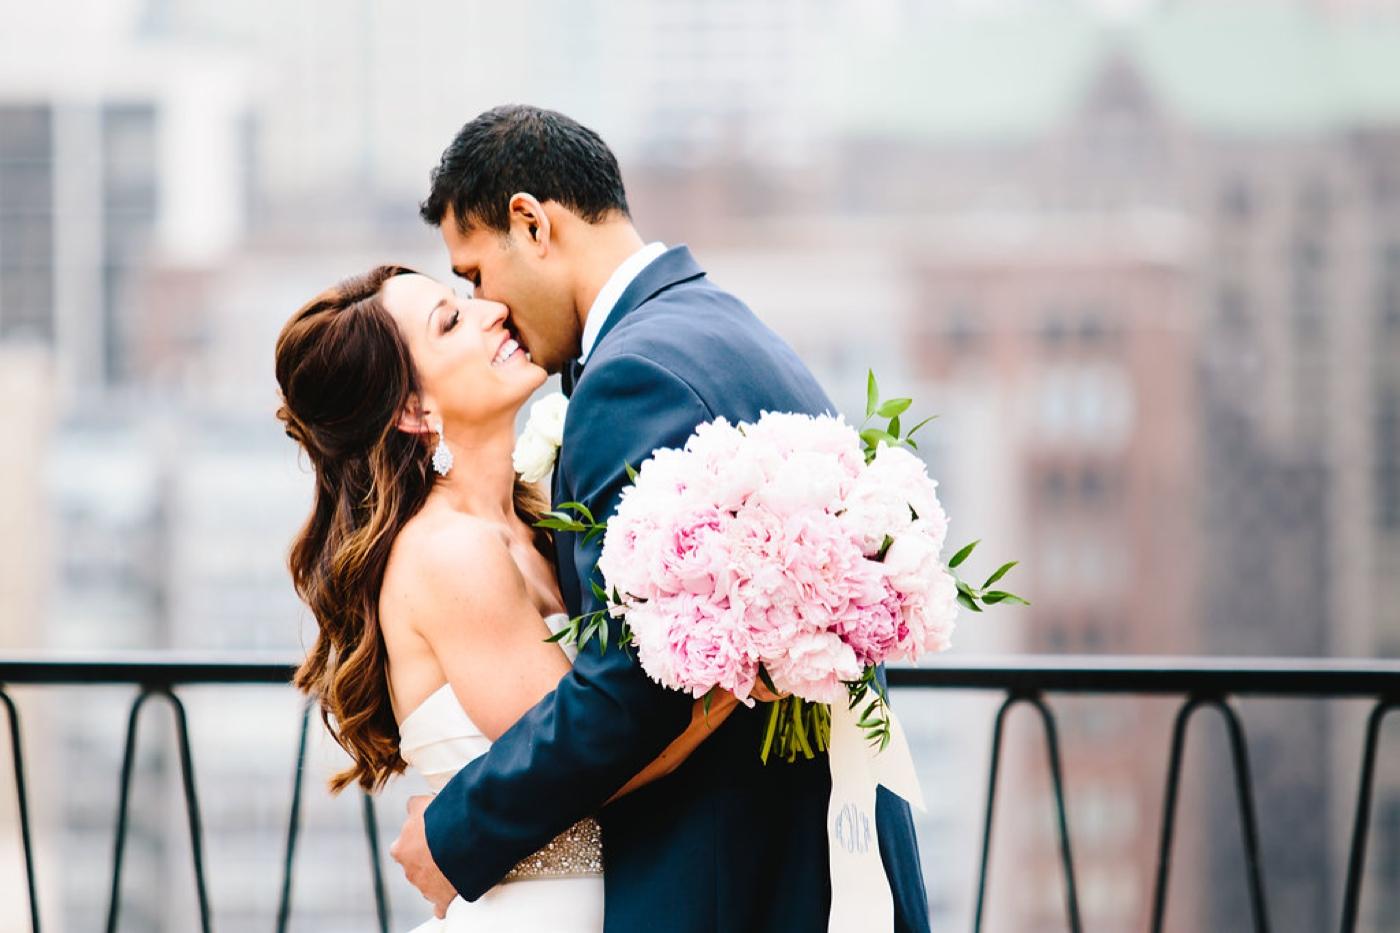 chicago-fine-art-wedding-photography-sakamuri25